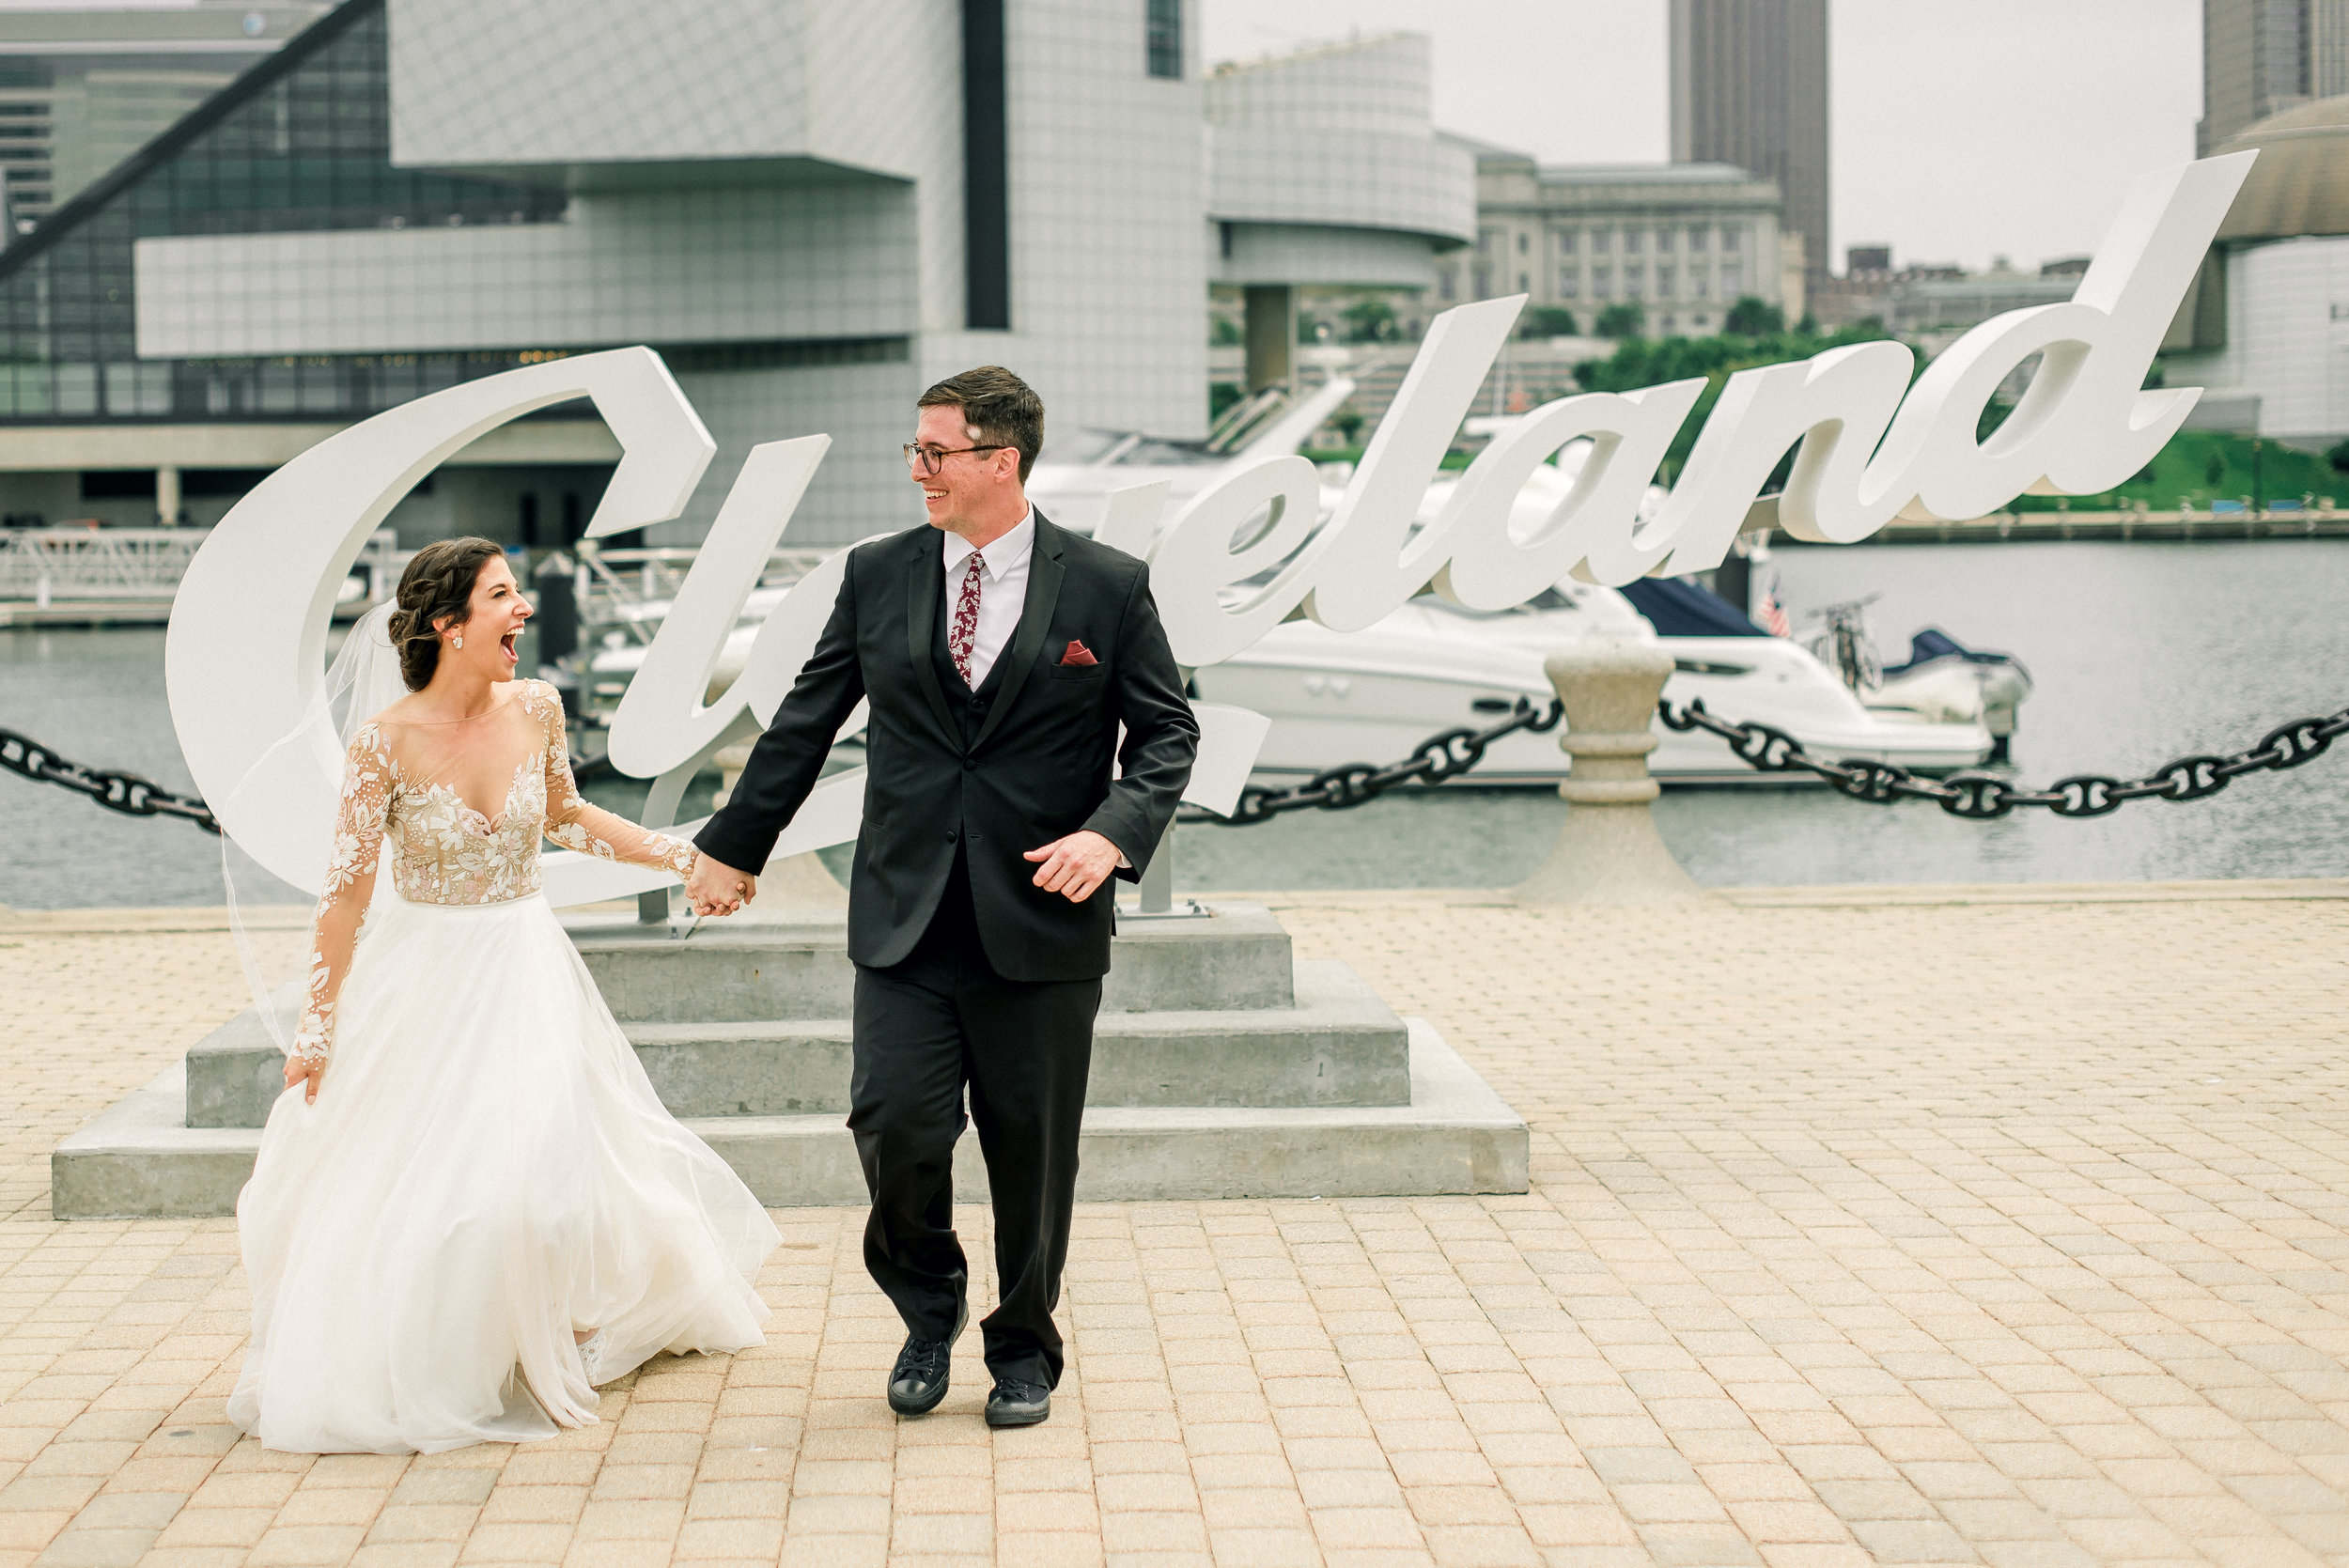 cleveland-wedding-photographer-great-lakes-brewing-arcade-0027.jpg